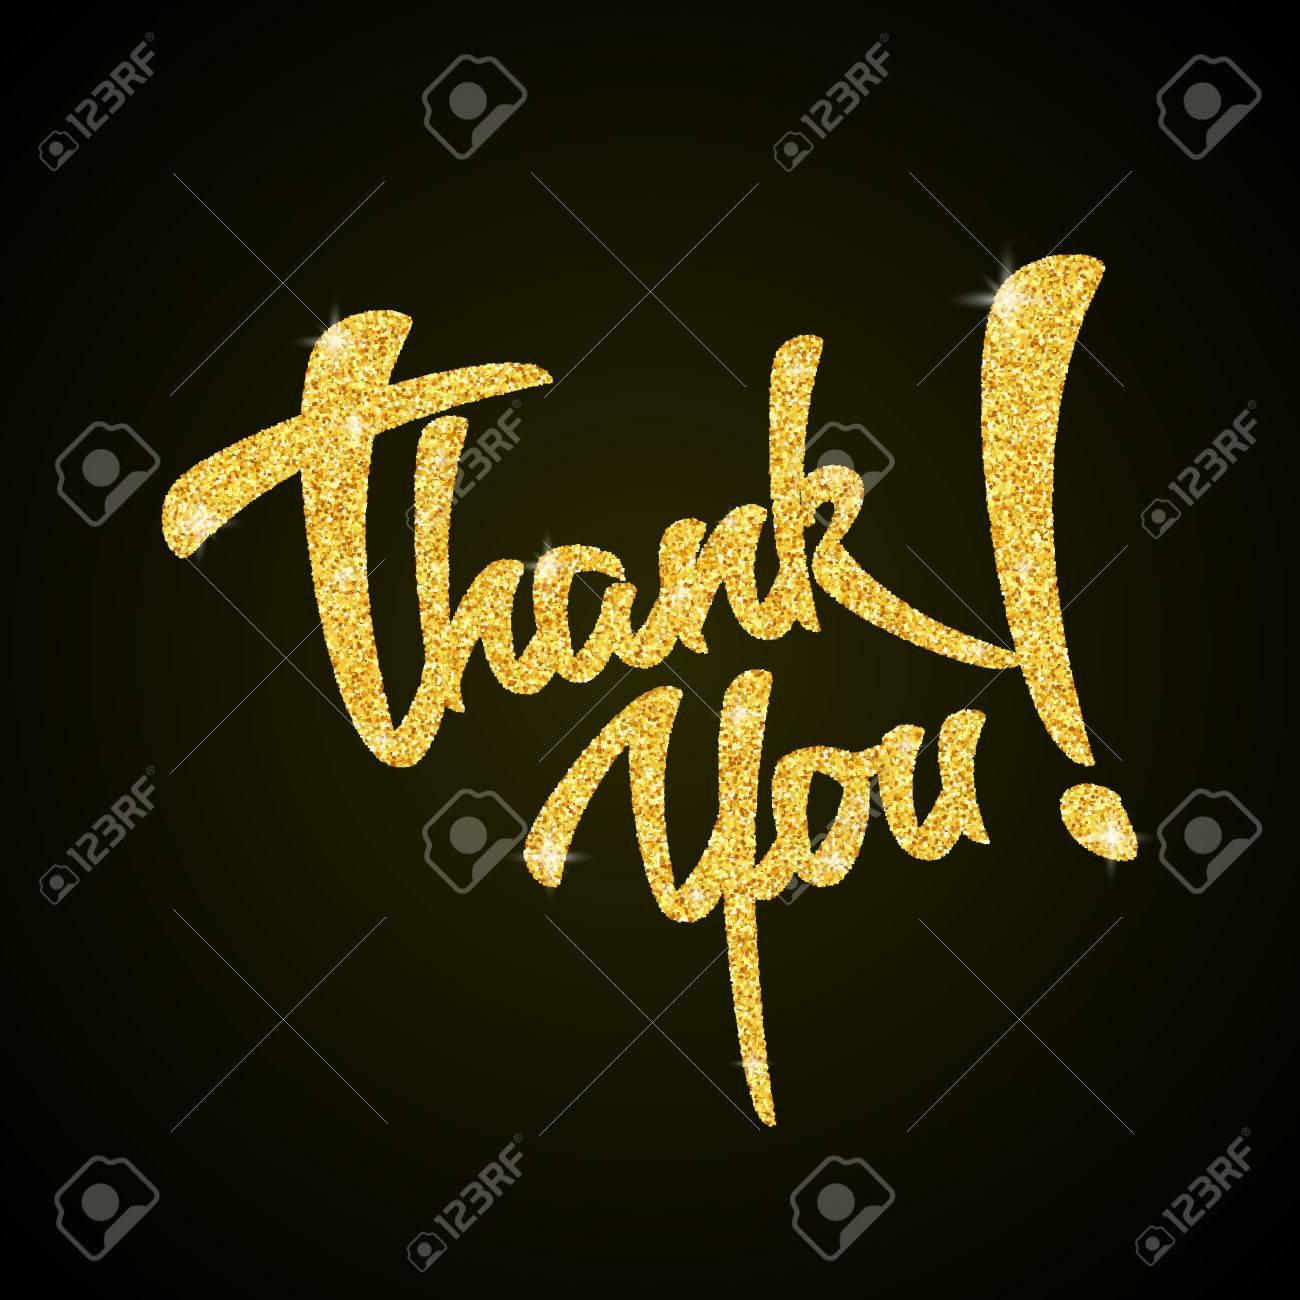 thank you black background